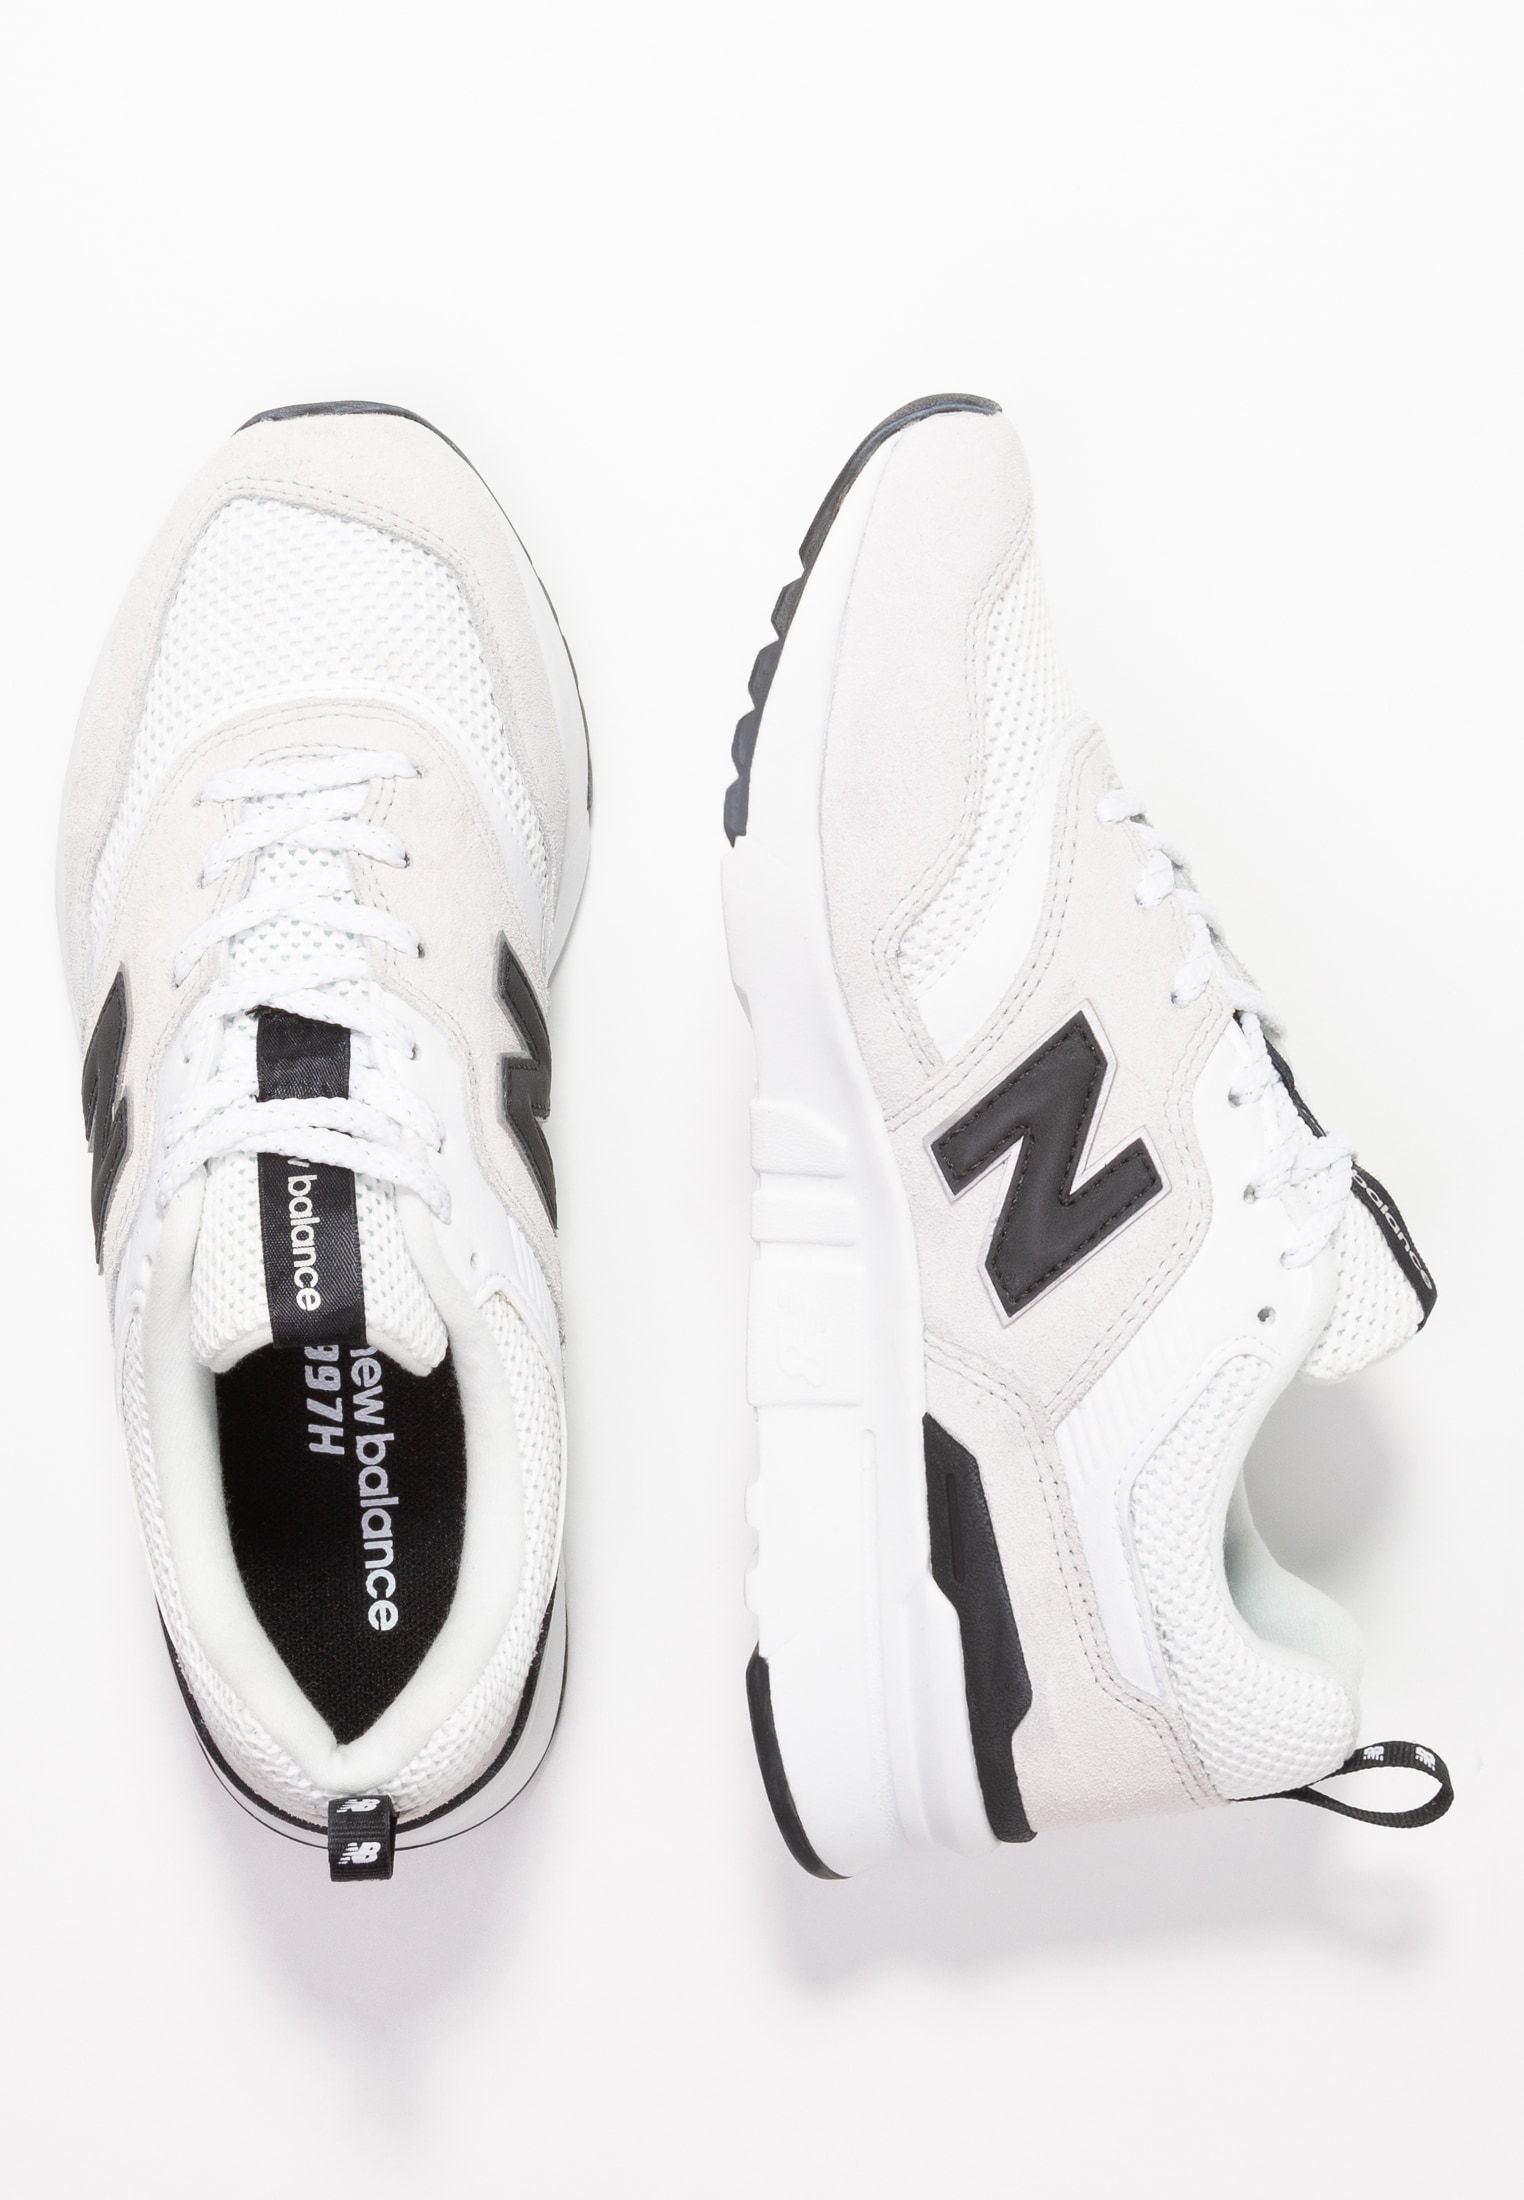 45596fa2 CW997 - Joggesko - white @ Zalando.no 🛒 в 2019 г. | Shoes